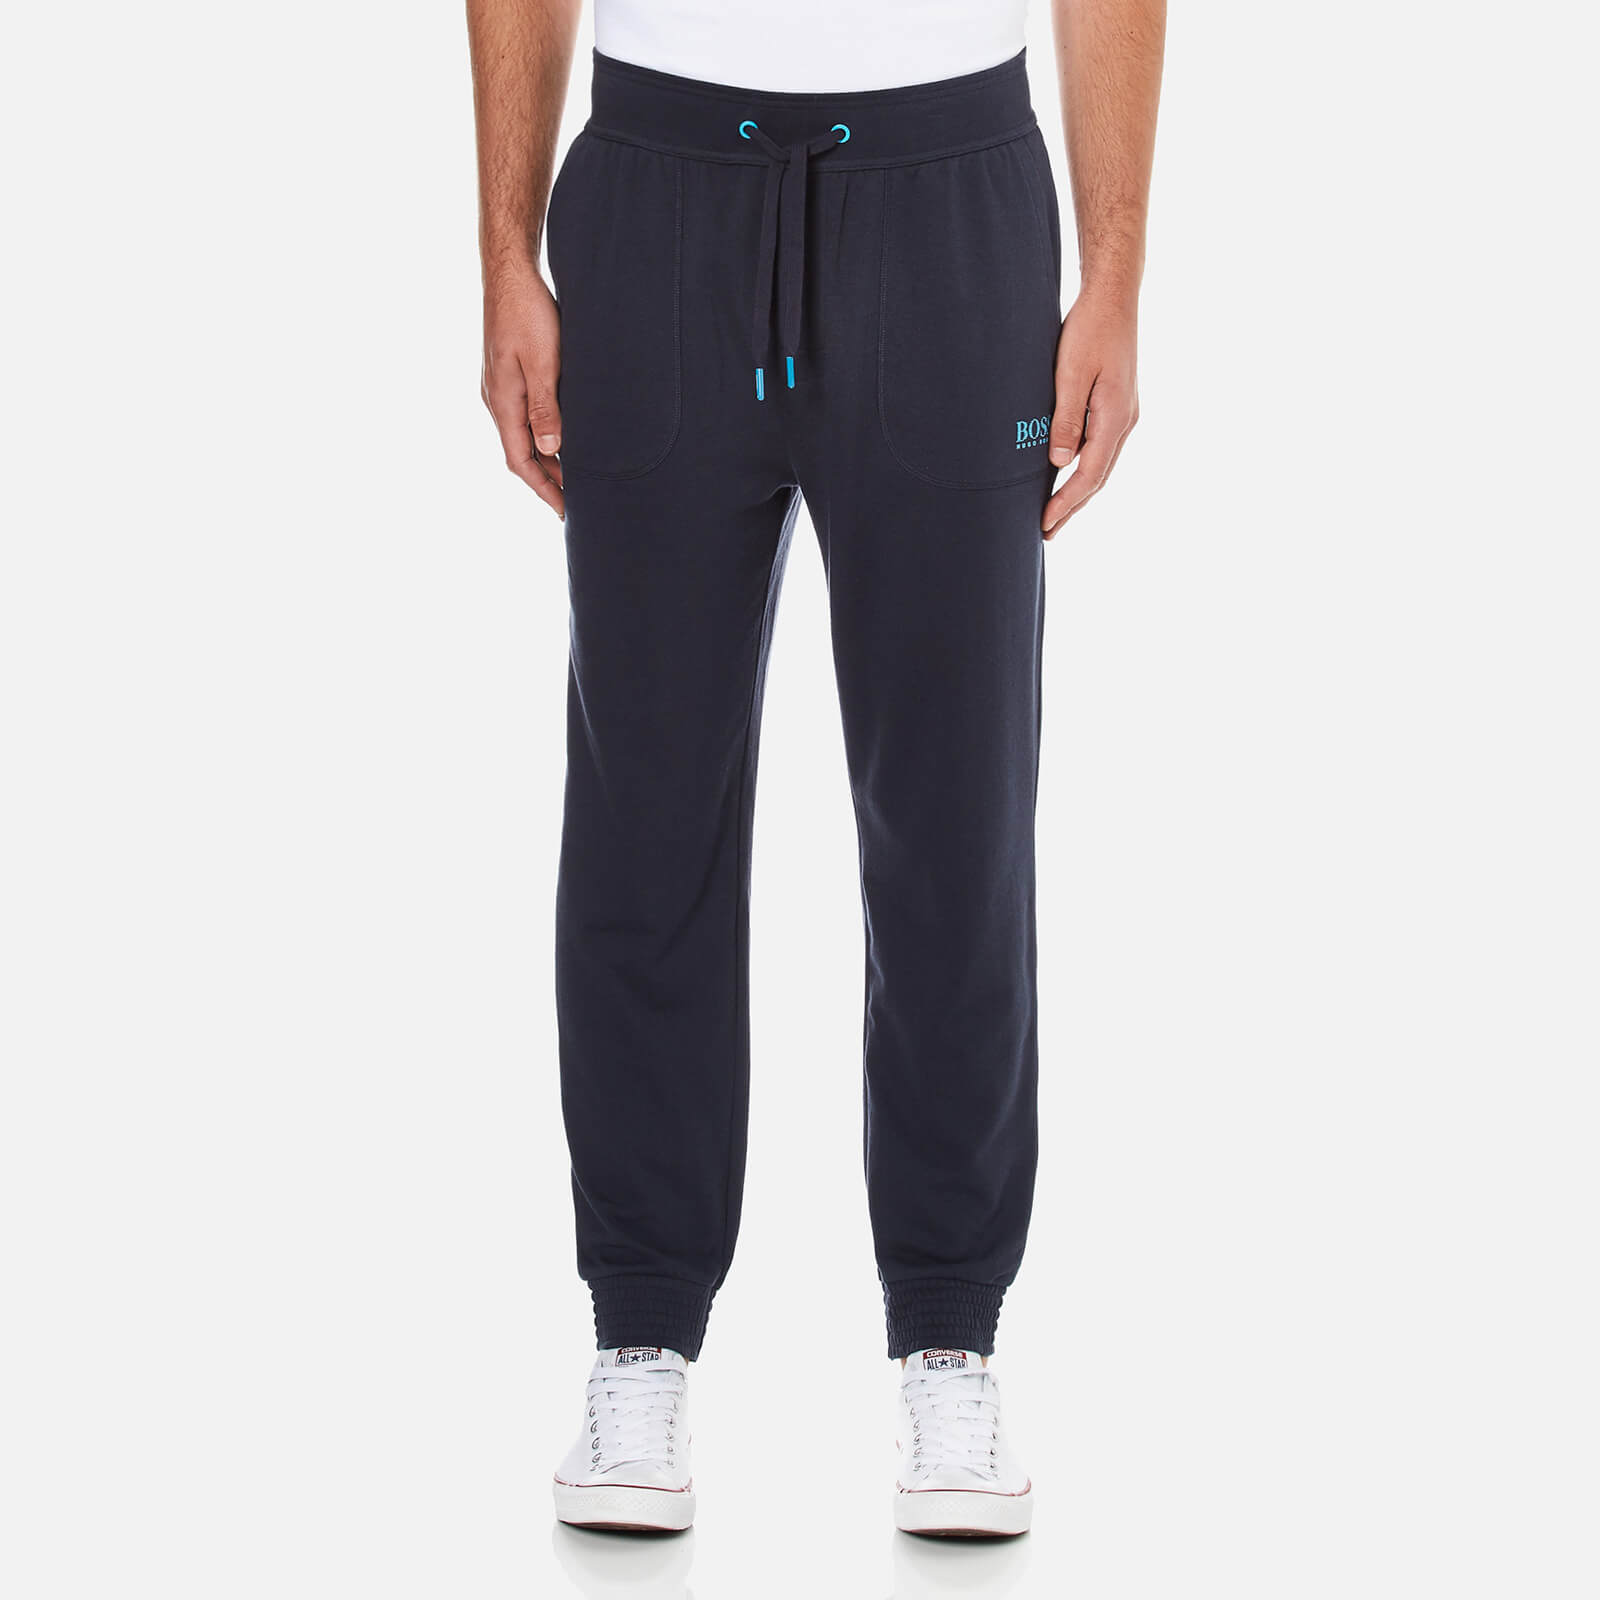 66cf05b101 BOSS Hugo Boss Men's Cuffed Sweat Pants - Navy - Free UK Delivery over £50